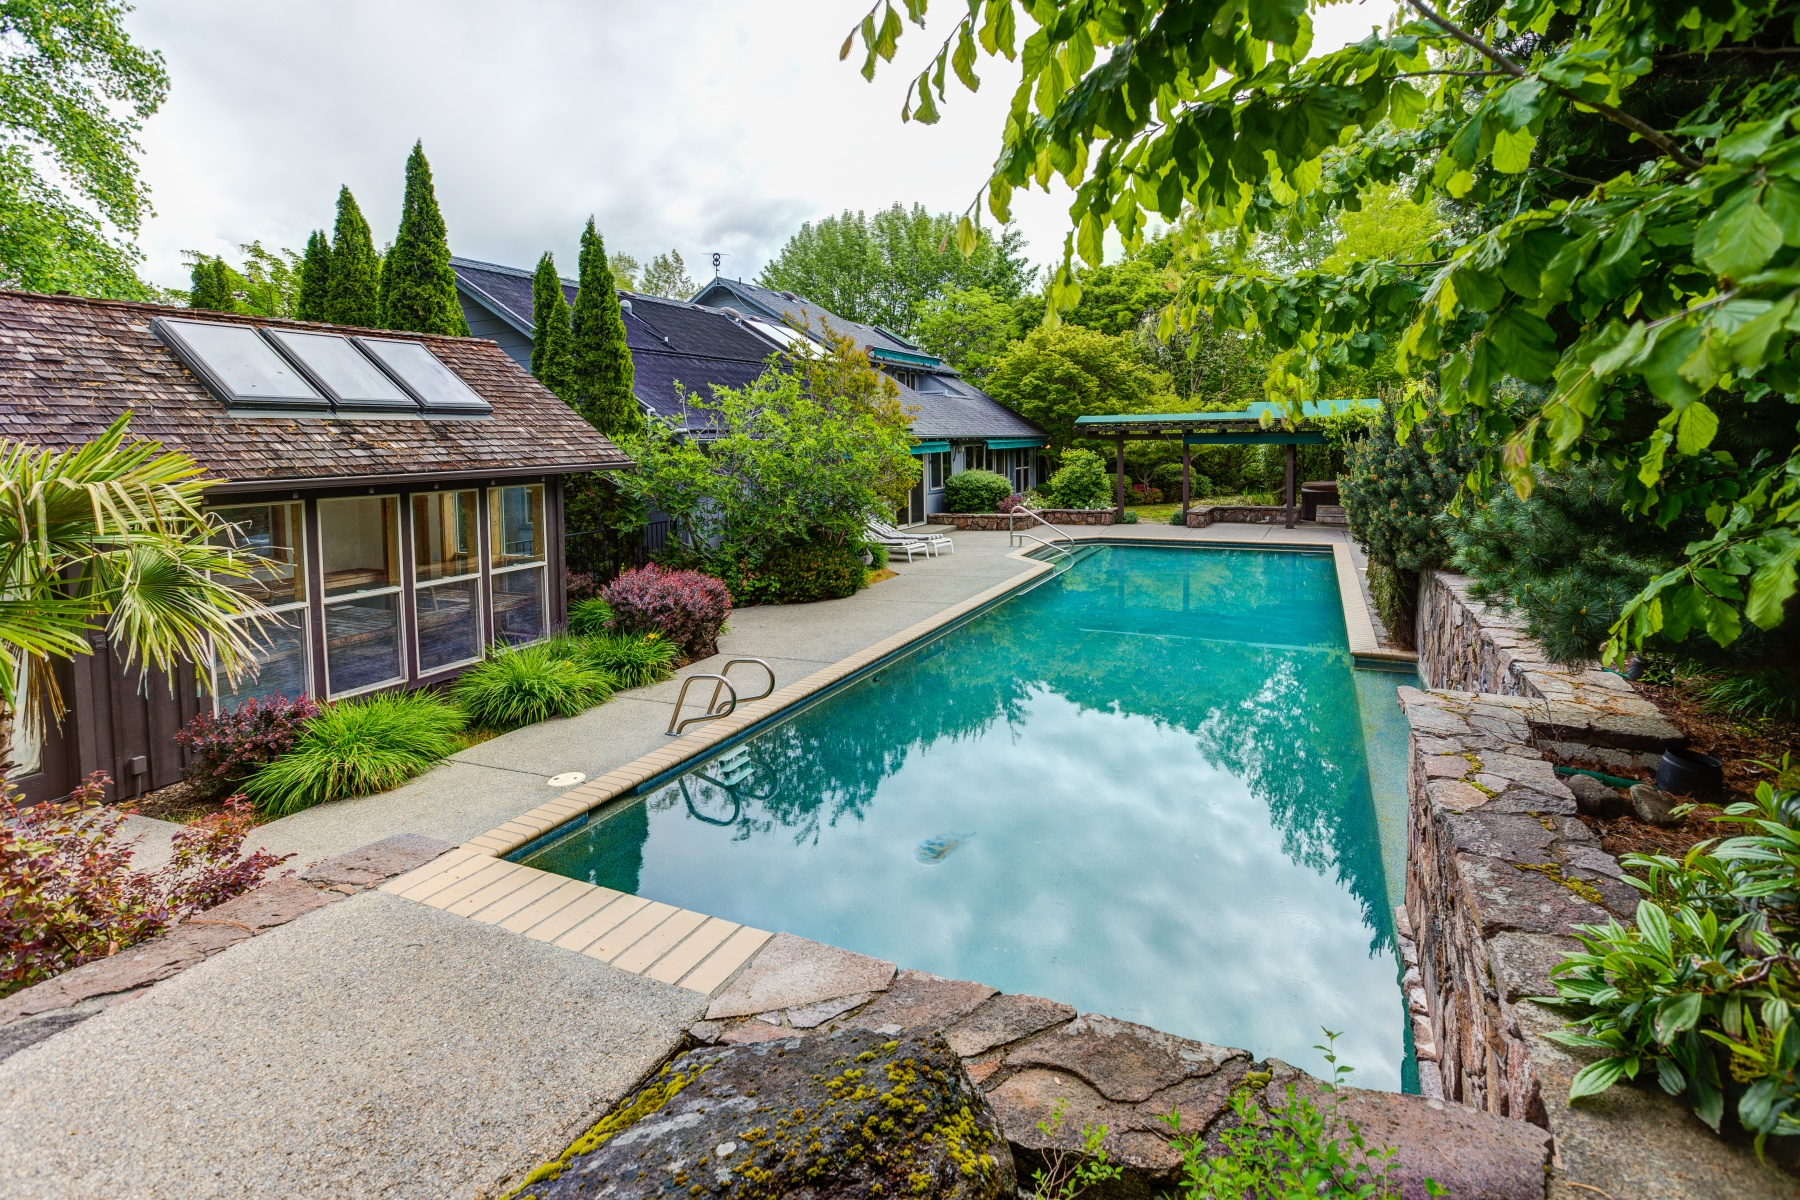 Single Family Home for Sale at 1365 Tolman Creek Ashland, Oregon, 97520 United States